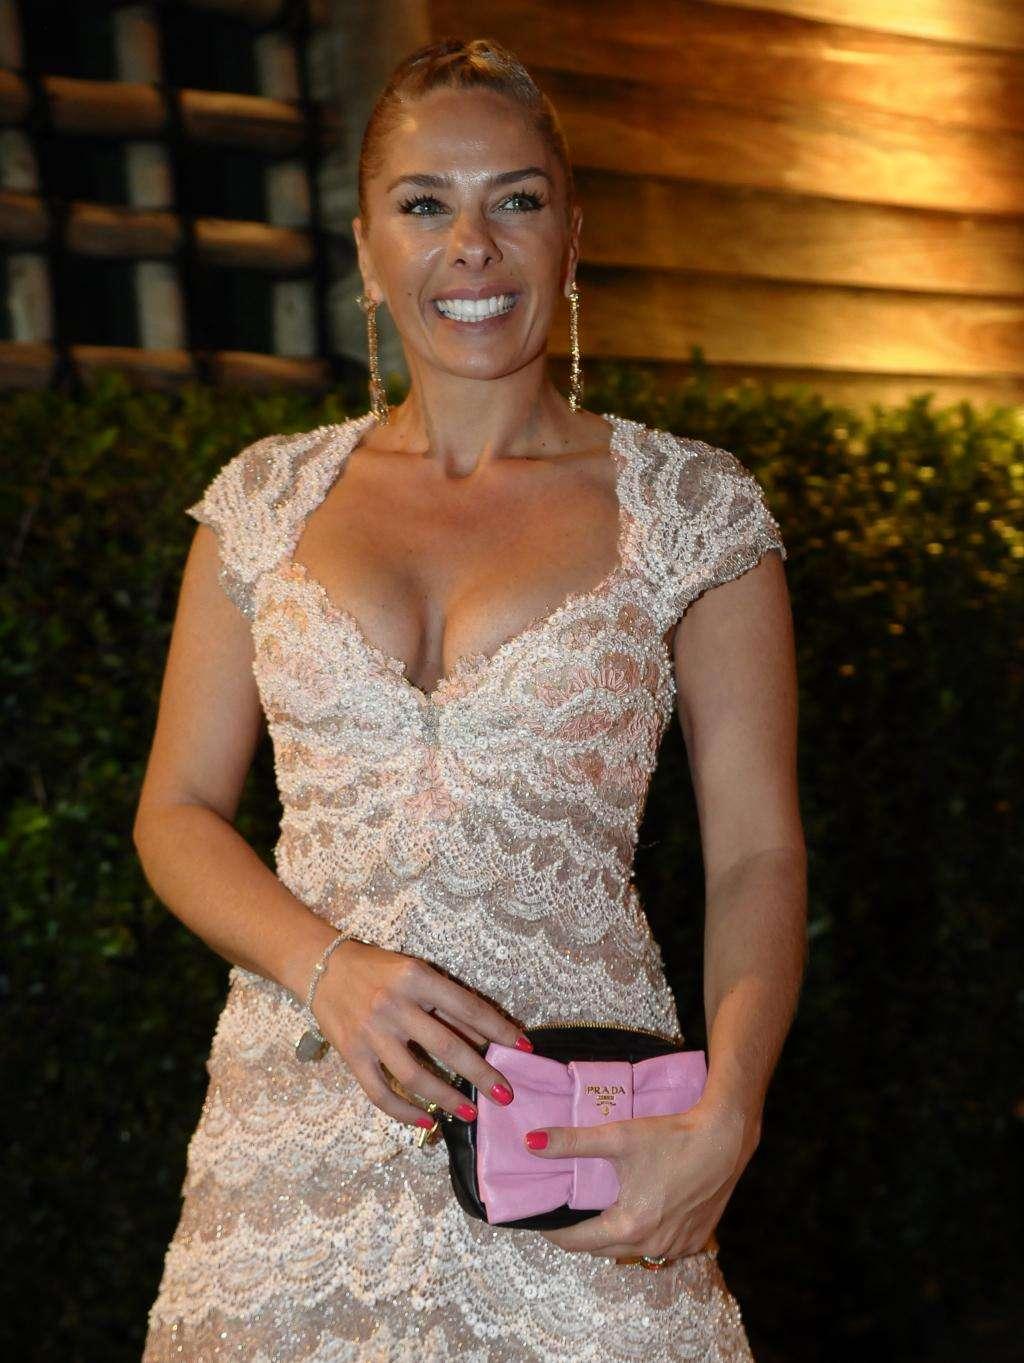 Jornal: SBT quer recontratar Adriane Galisteu